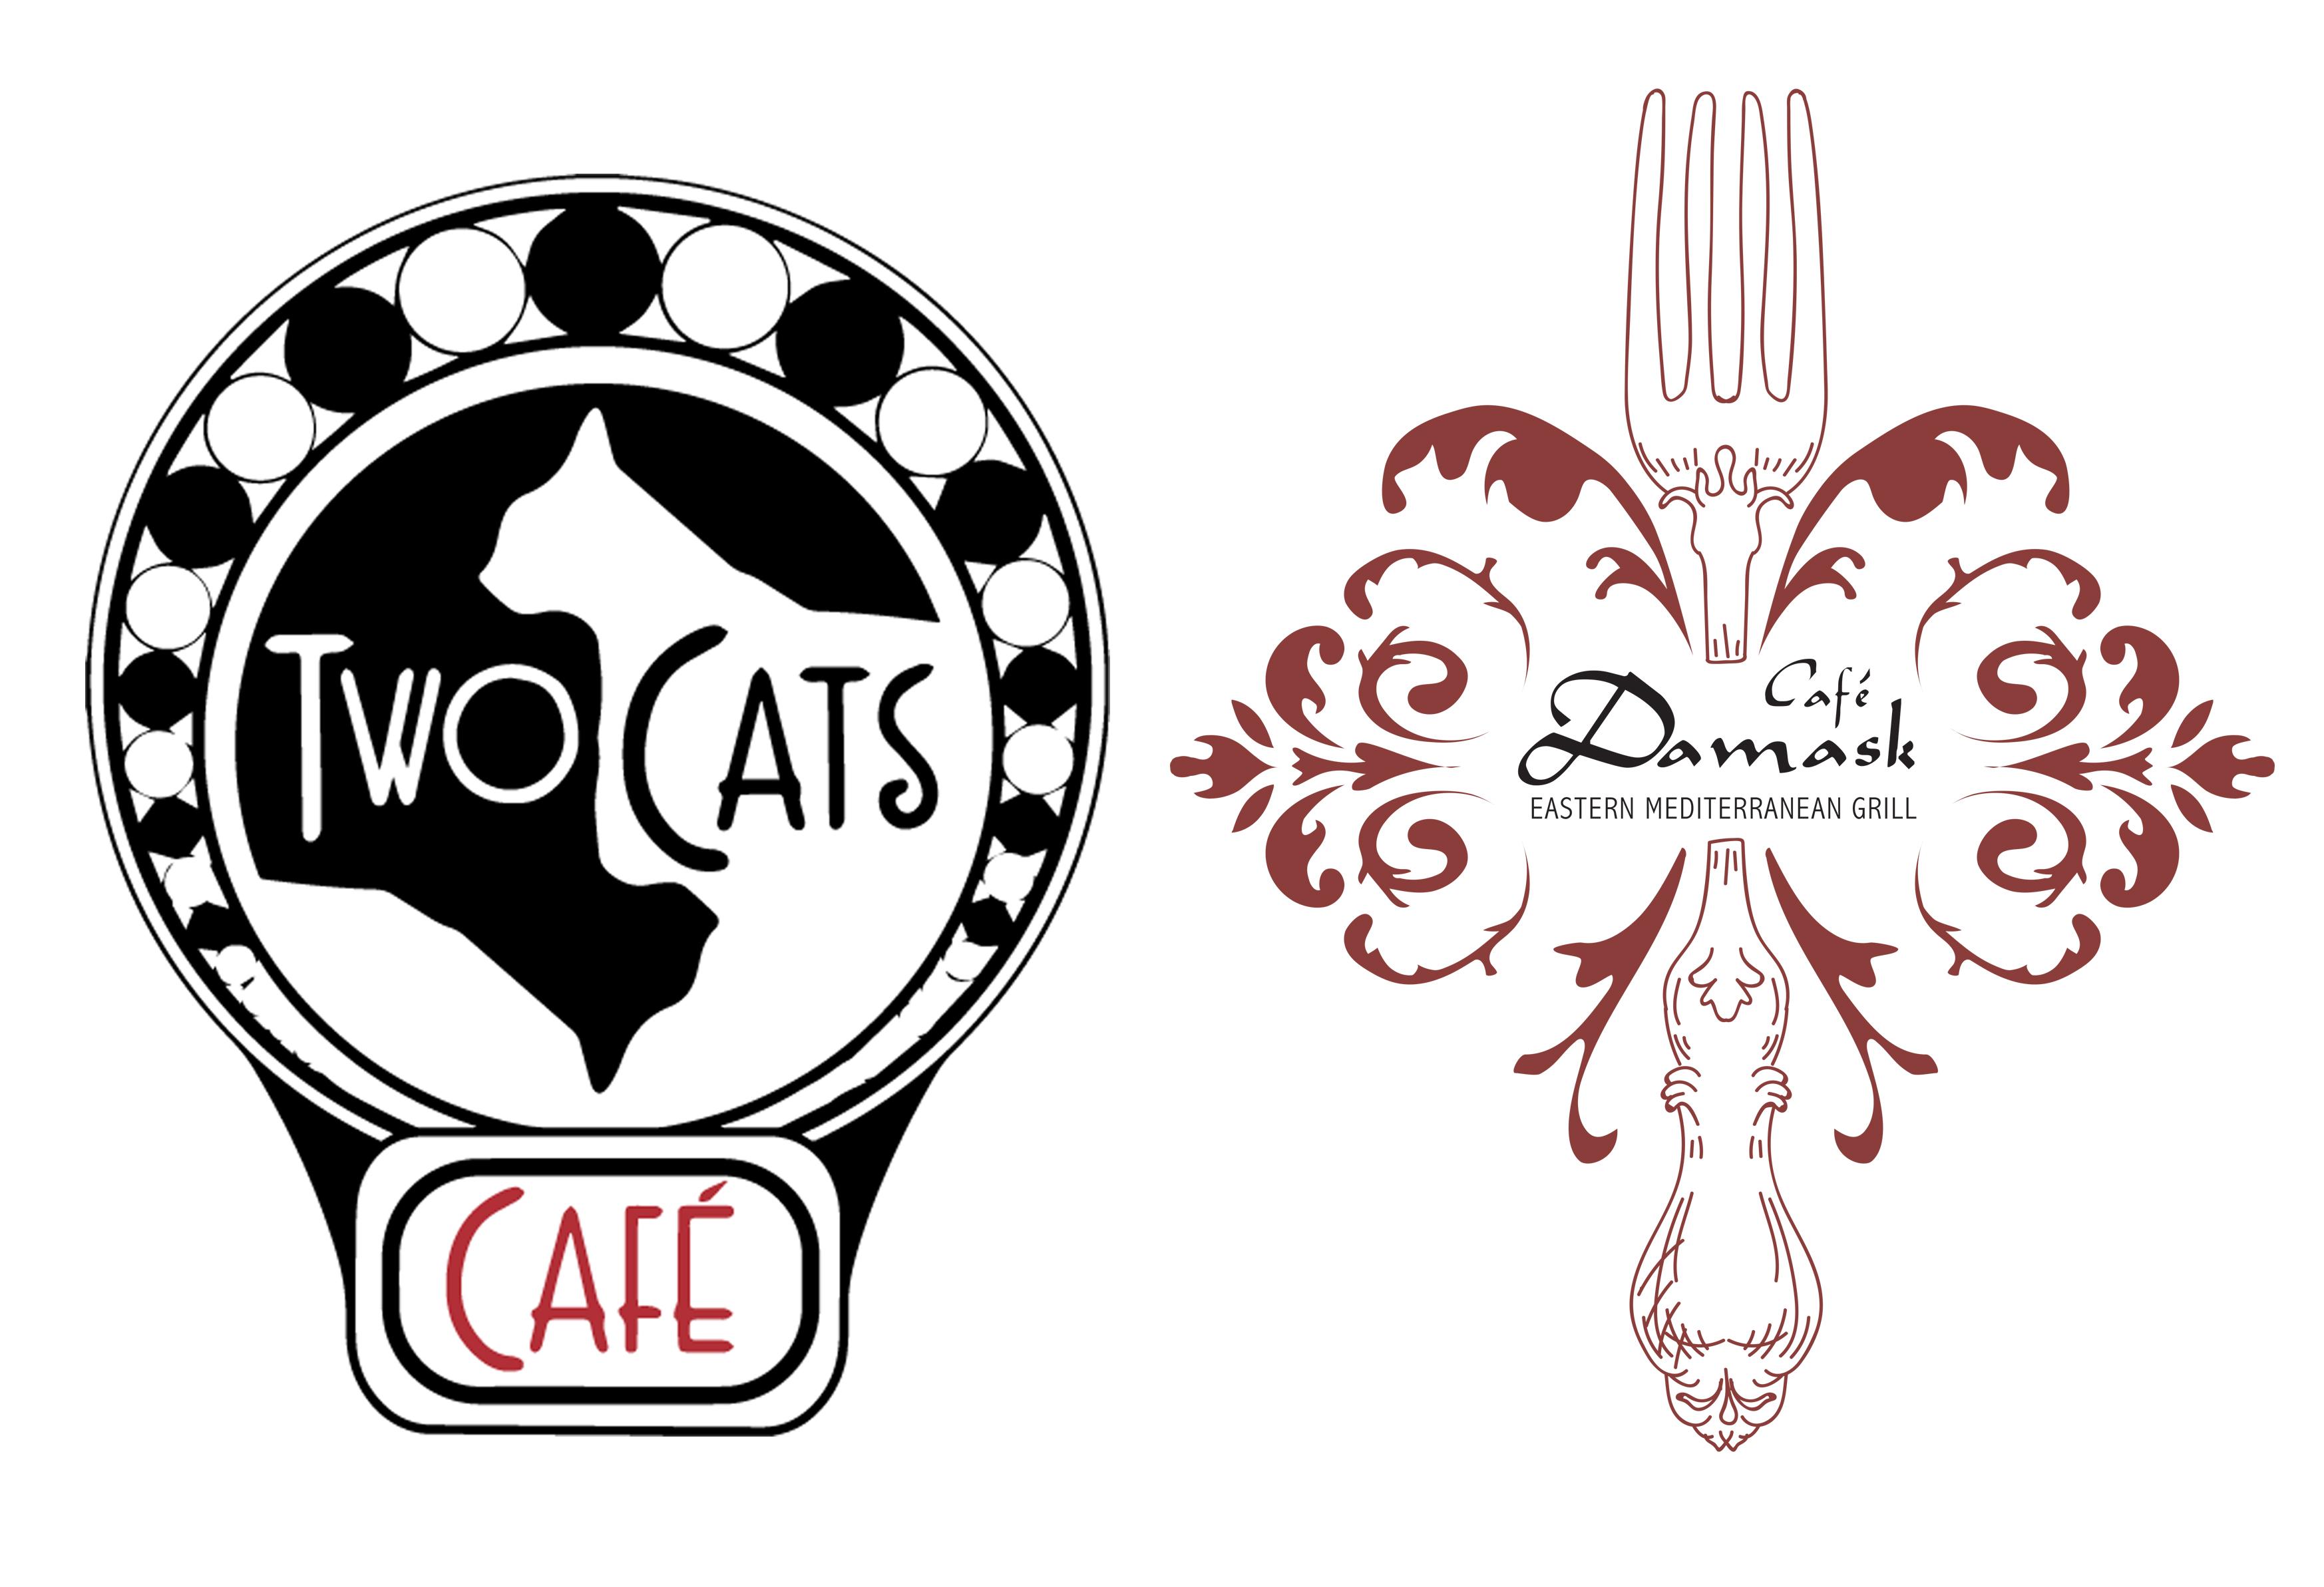 Two Cats Cafe/Damask Cafe